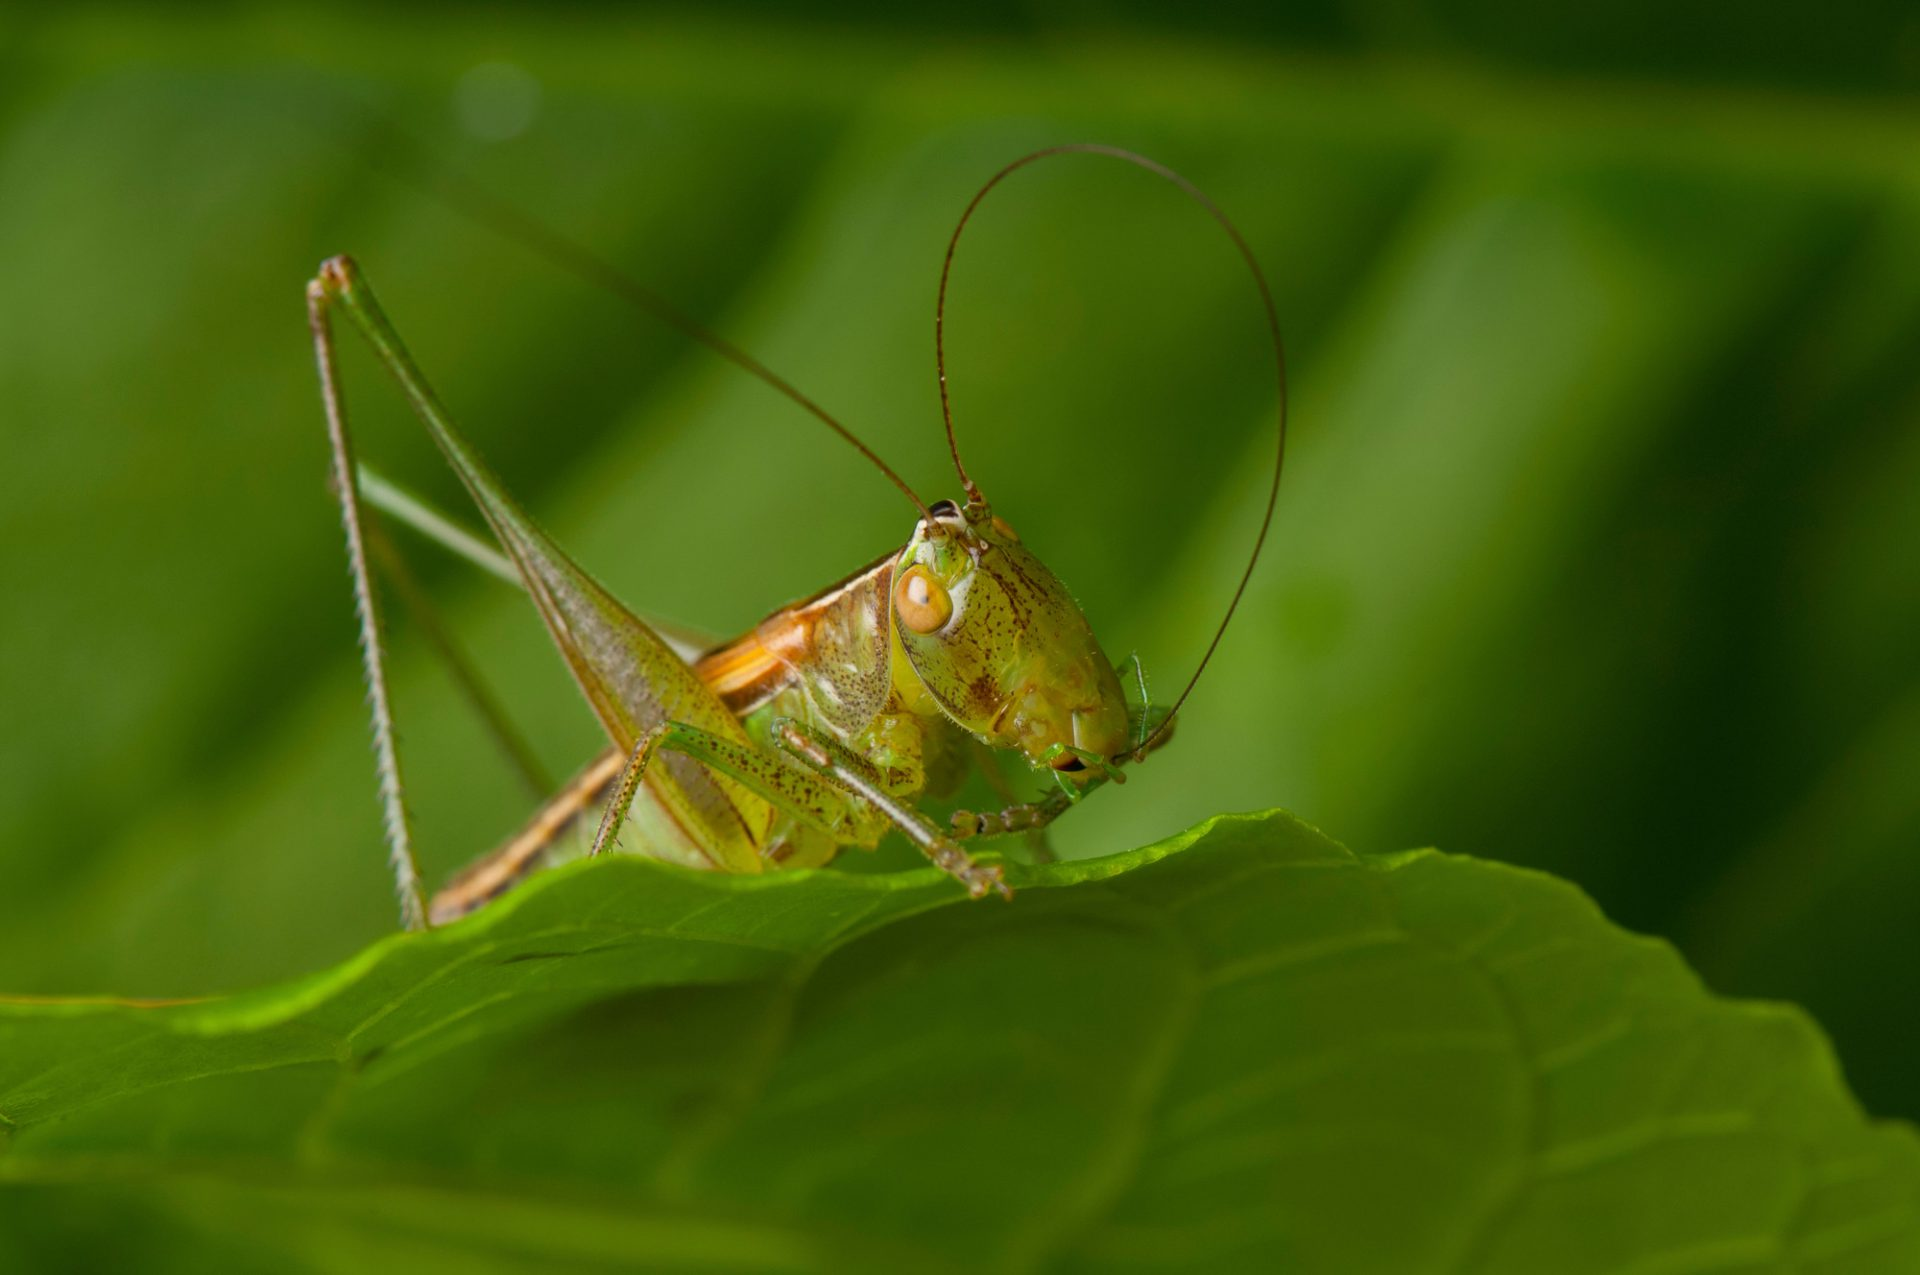 Photo: A gladiator meadow katydid (Orchelimum gladiator) found at Spring Creek Prairie near Denton, Nebraska.